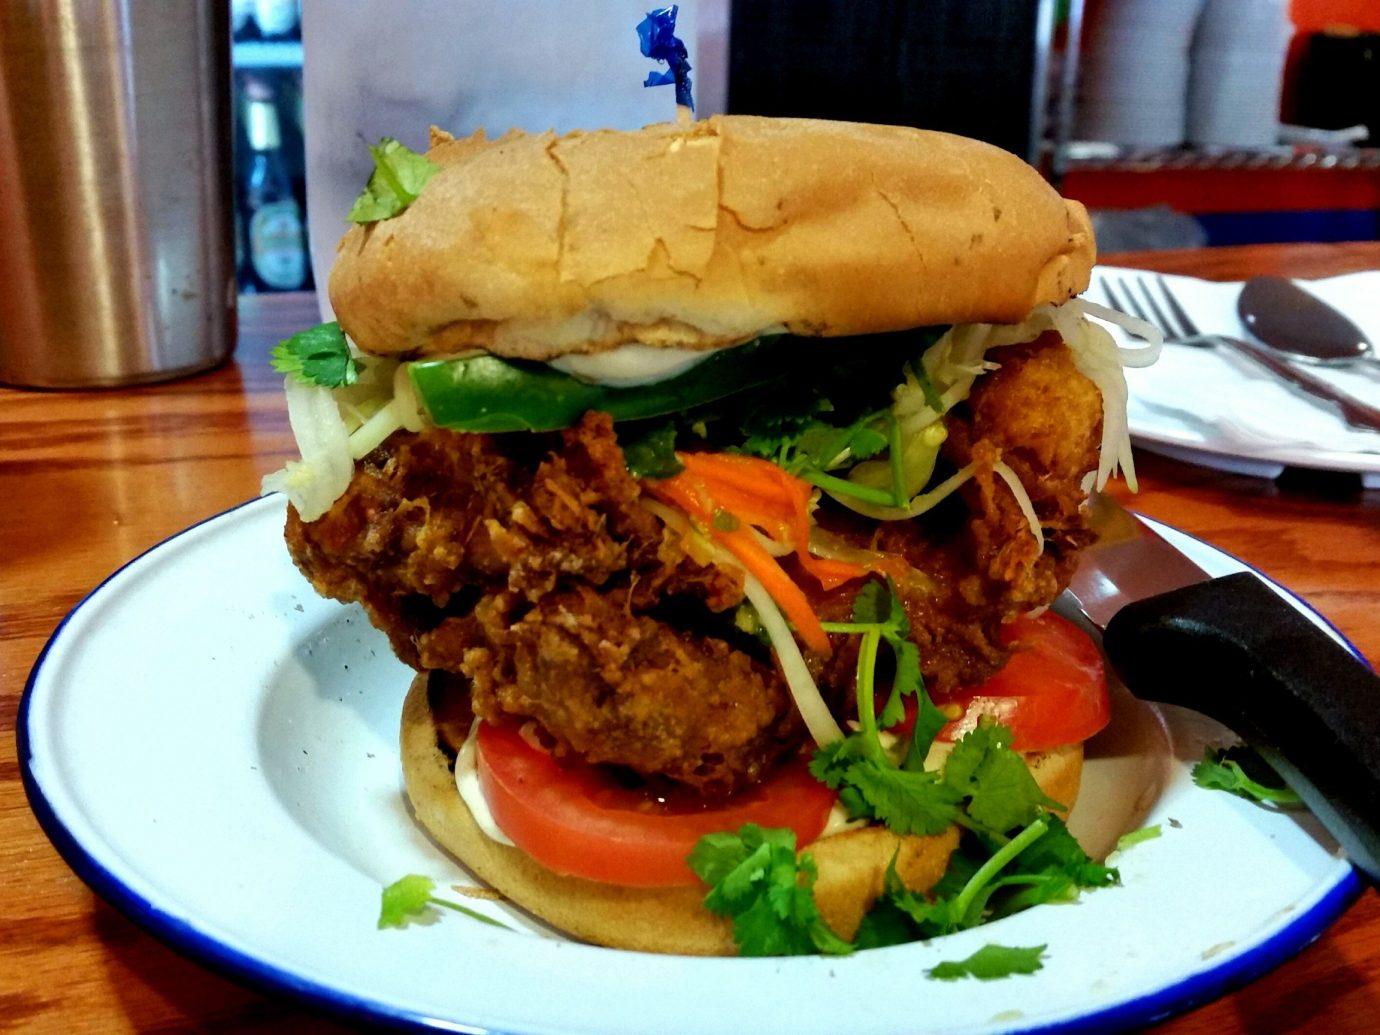 Food + Drink table food plate dish hamburger indoor lunch veggie burger meal restaurant meat sandwich snack food fast food produce fried food breakfast cuisine piece de resistance